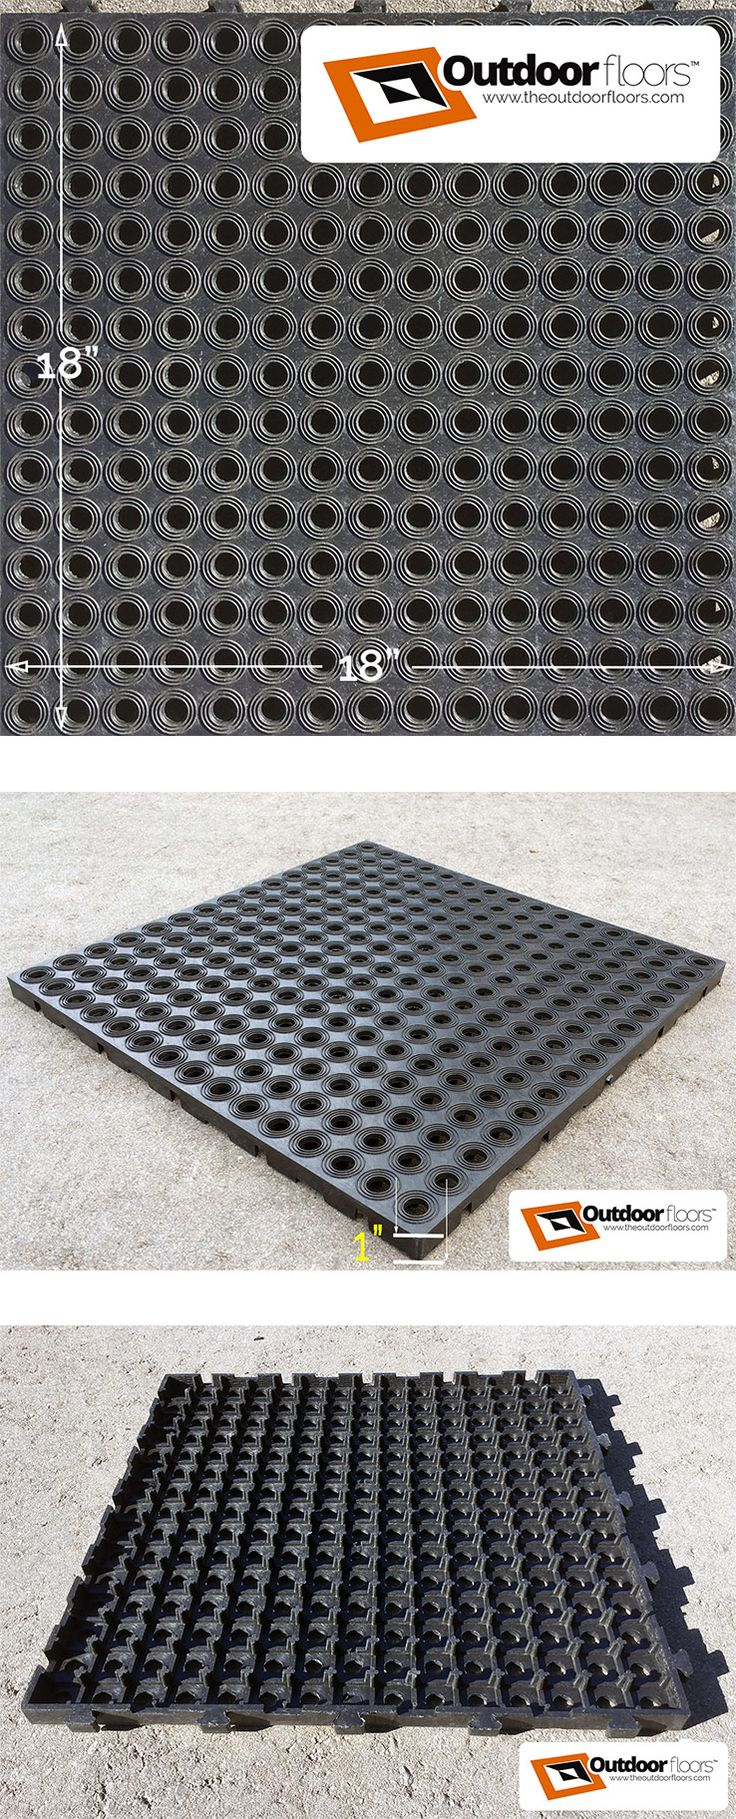 ExtremeFloor garage flooring tile. Interlocking, heavy-duty 18x18x1 inch tiles keep garages clean and dry. Garage floor gifts and ideas.